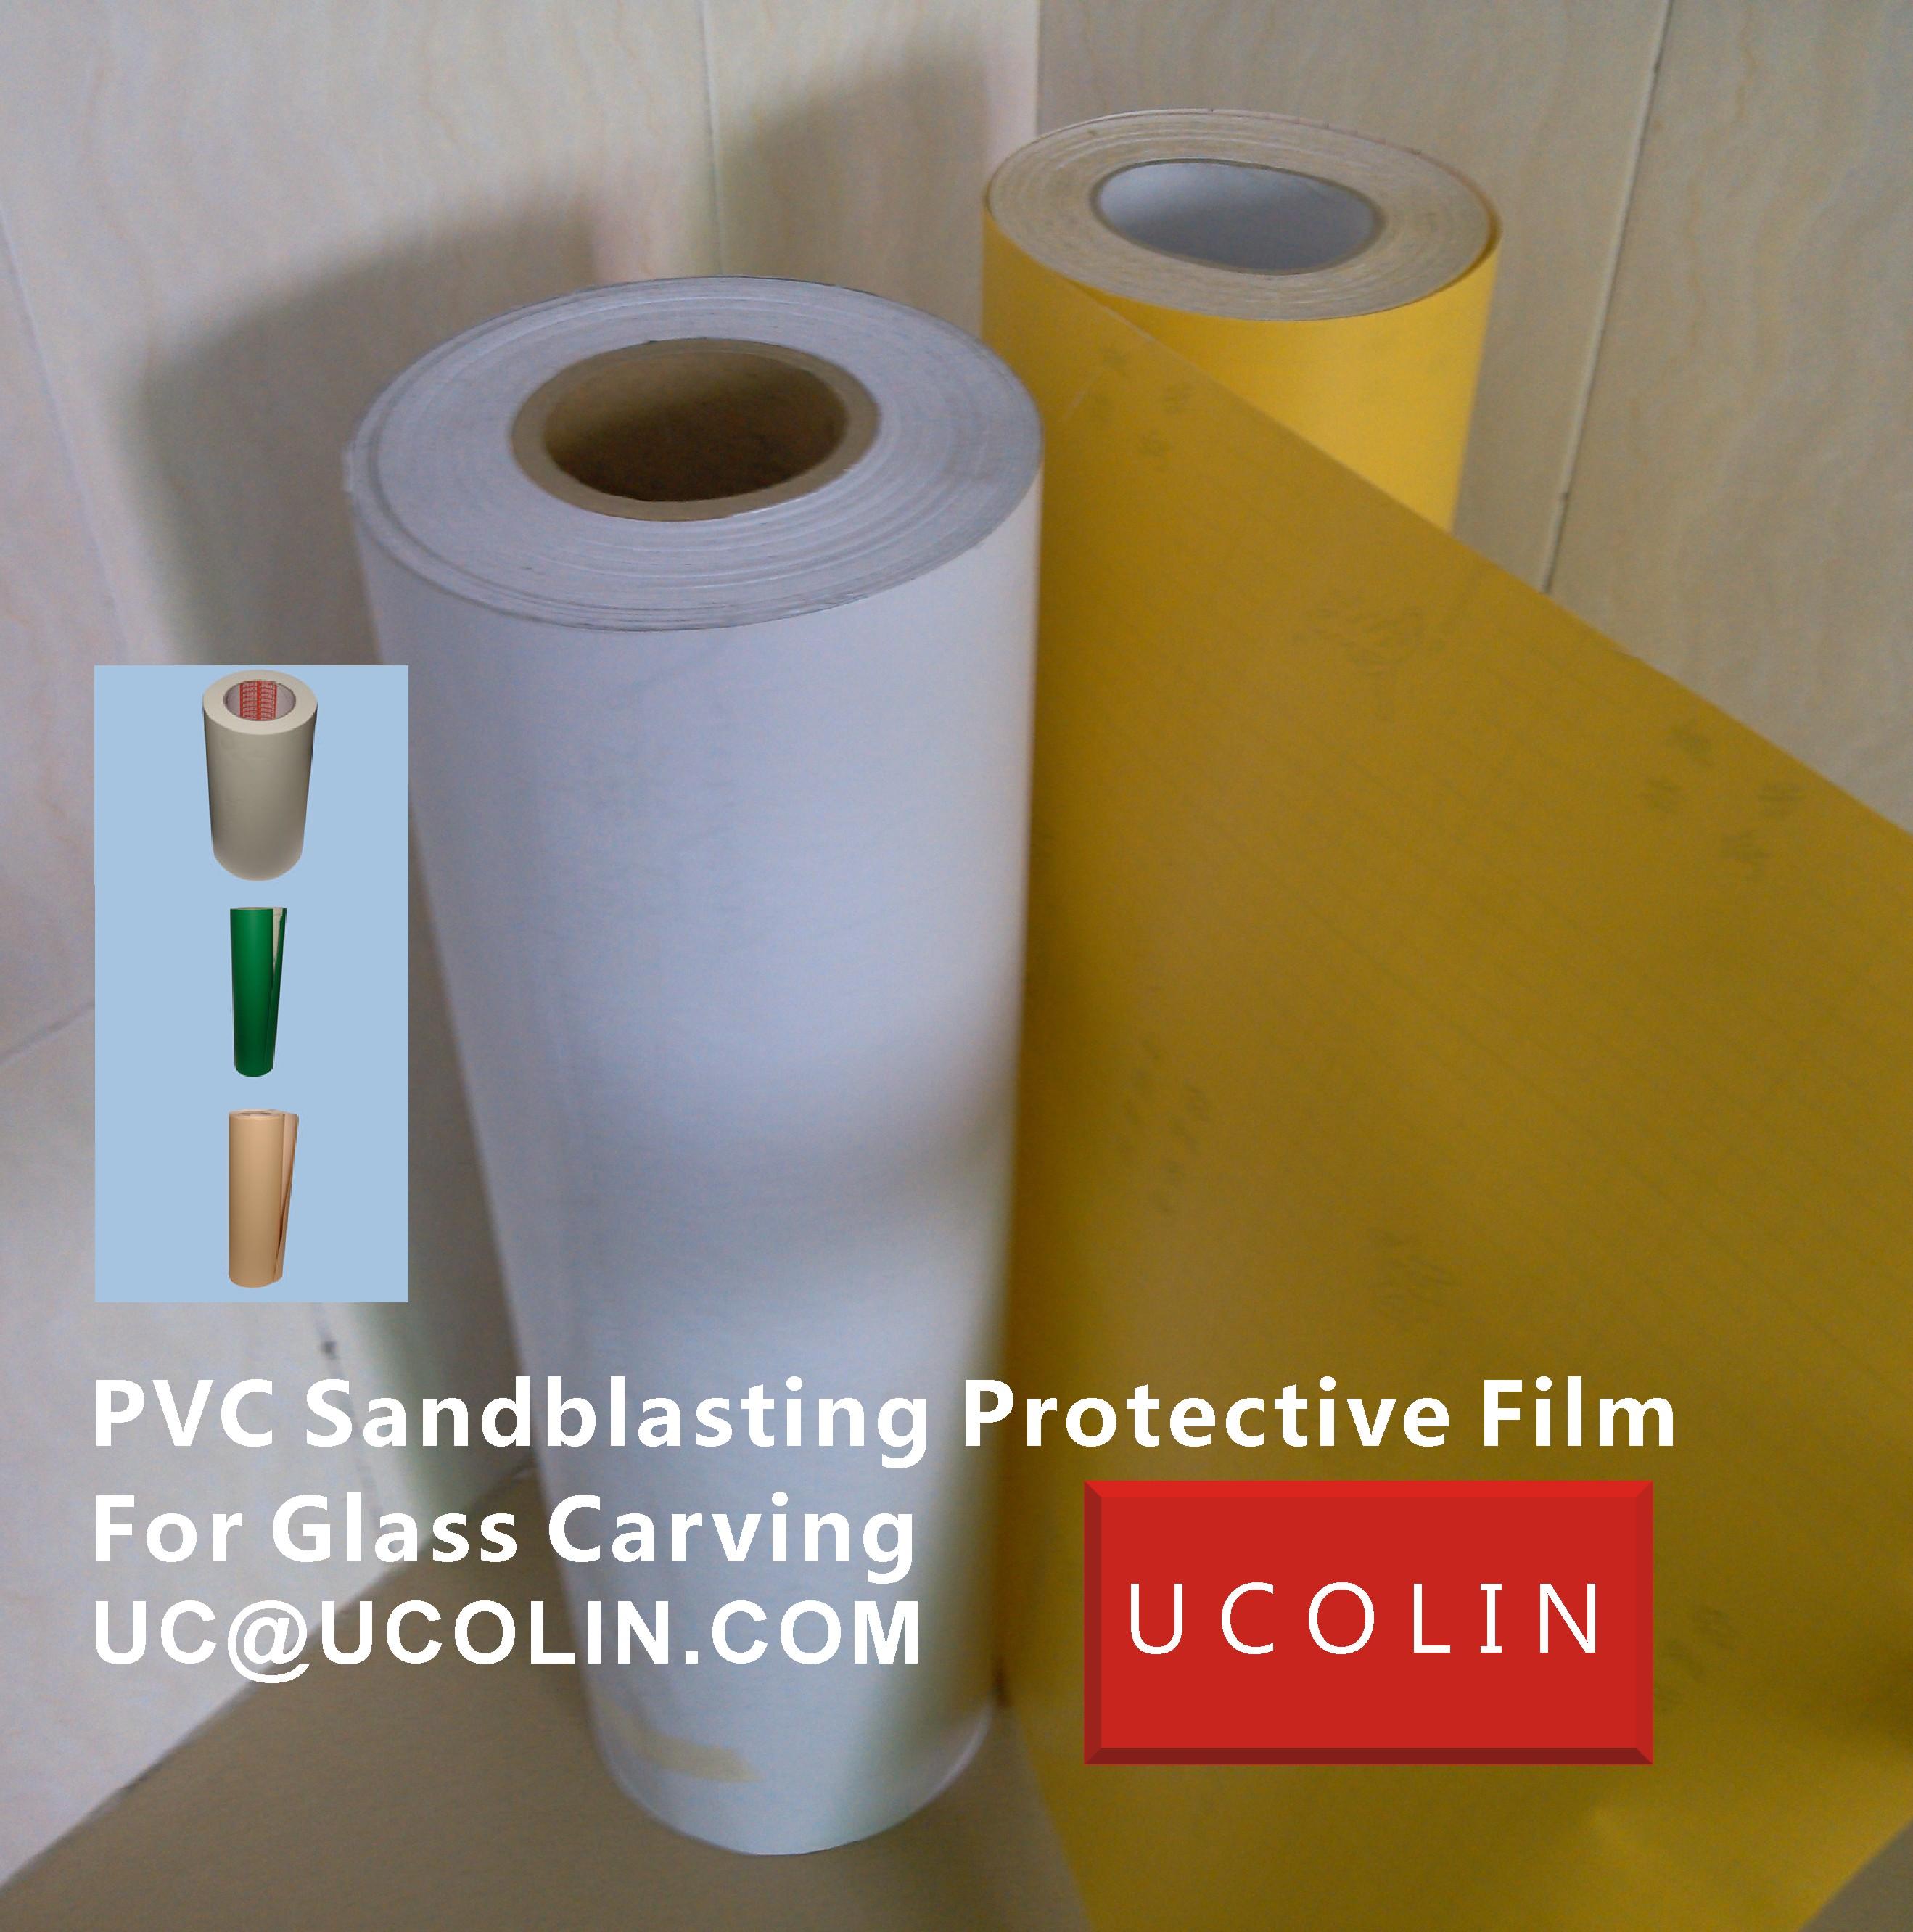 03 PVC Sandblasting Protective Film For Glass Carving